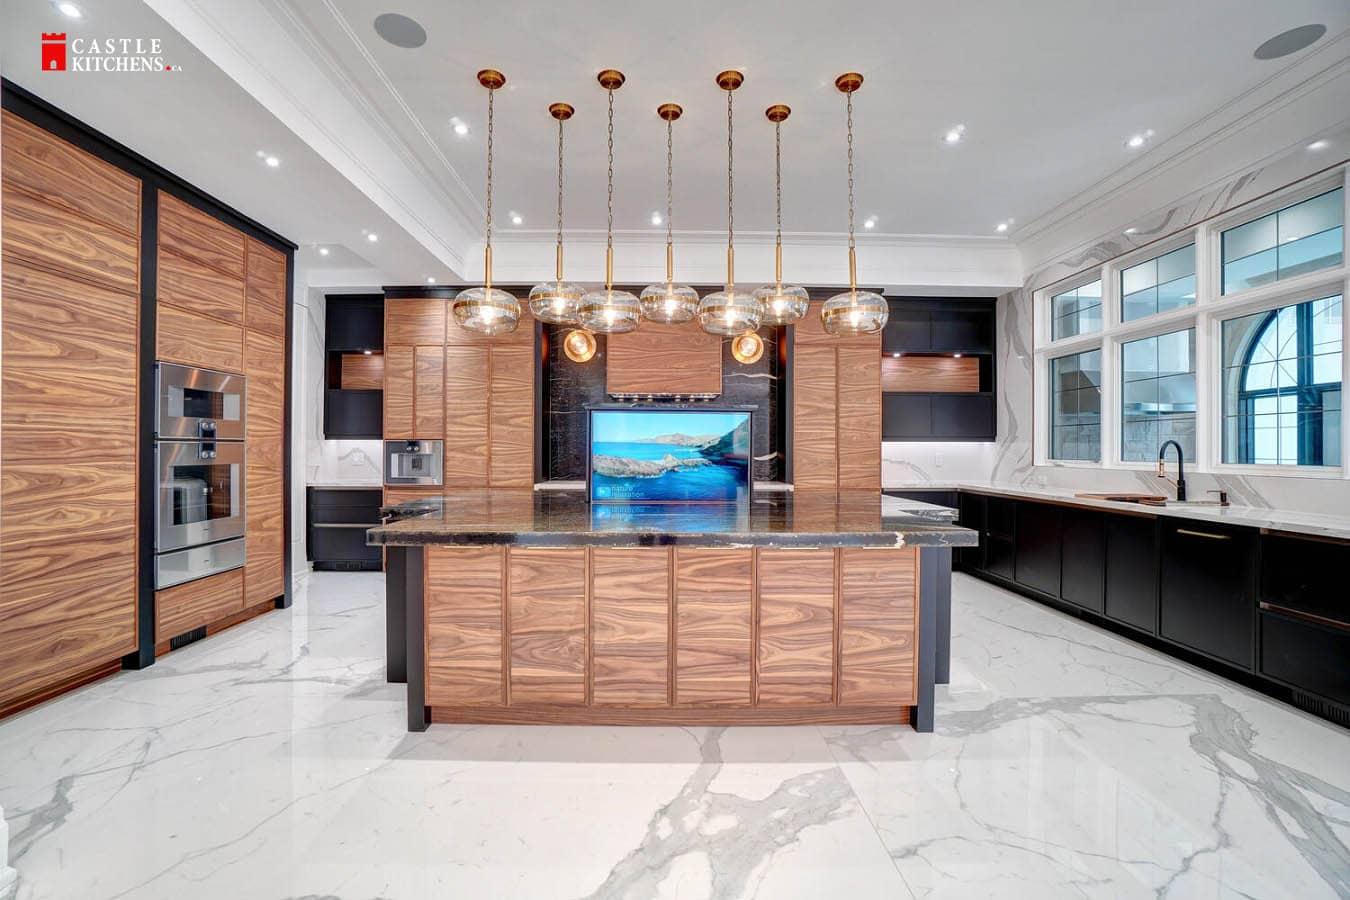 Kitchen Remodeling And Renovation Toronto